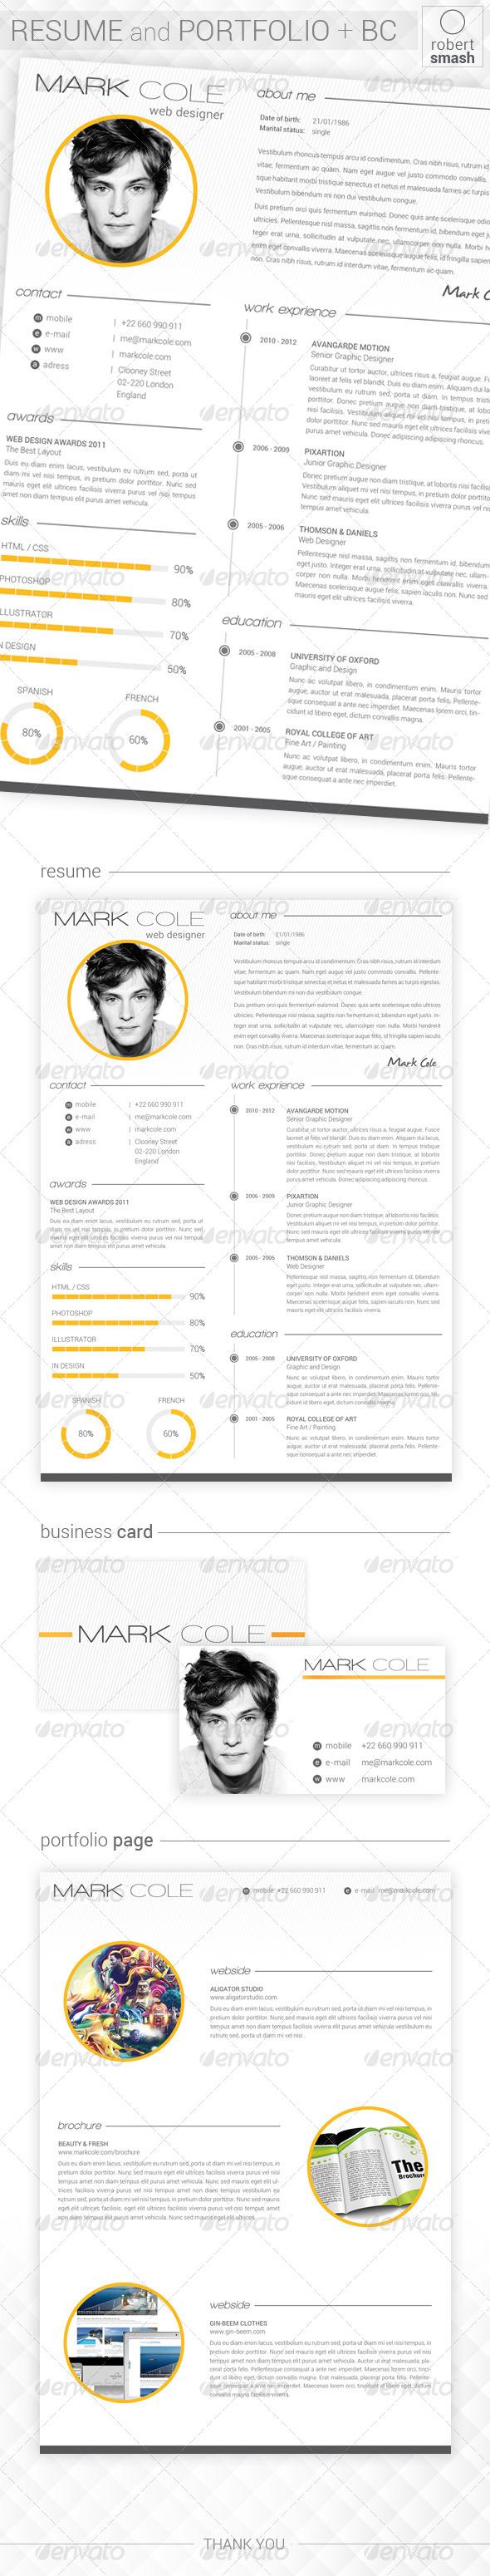 GraphicRiver Clean Resume & Portfolio & BC 6426180